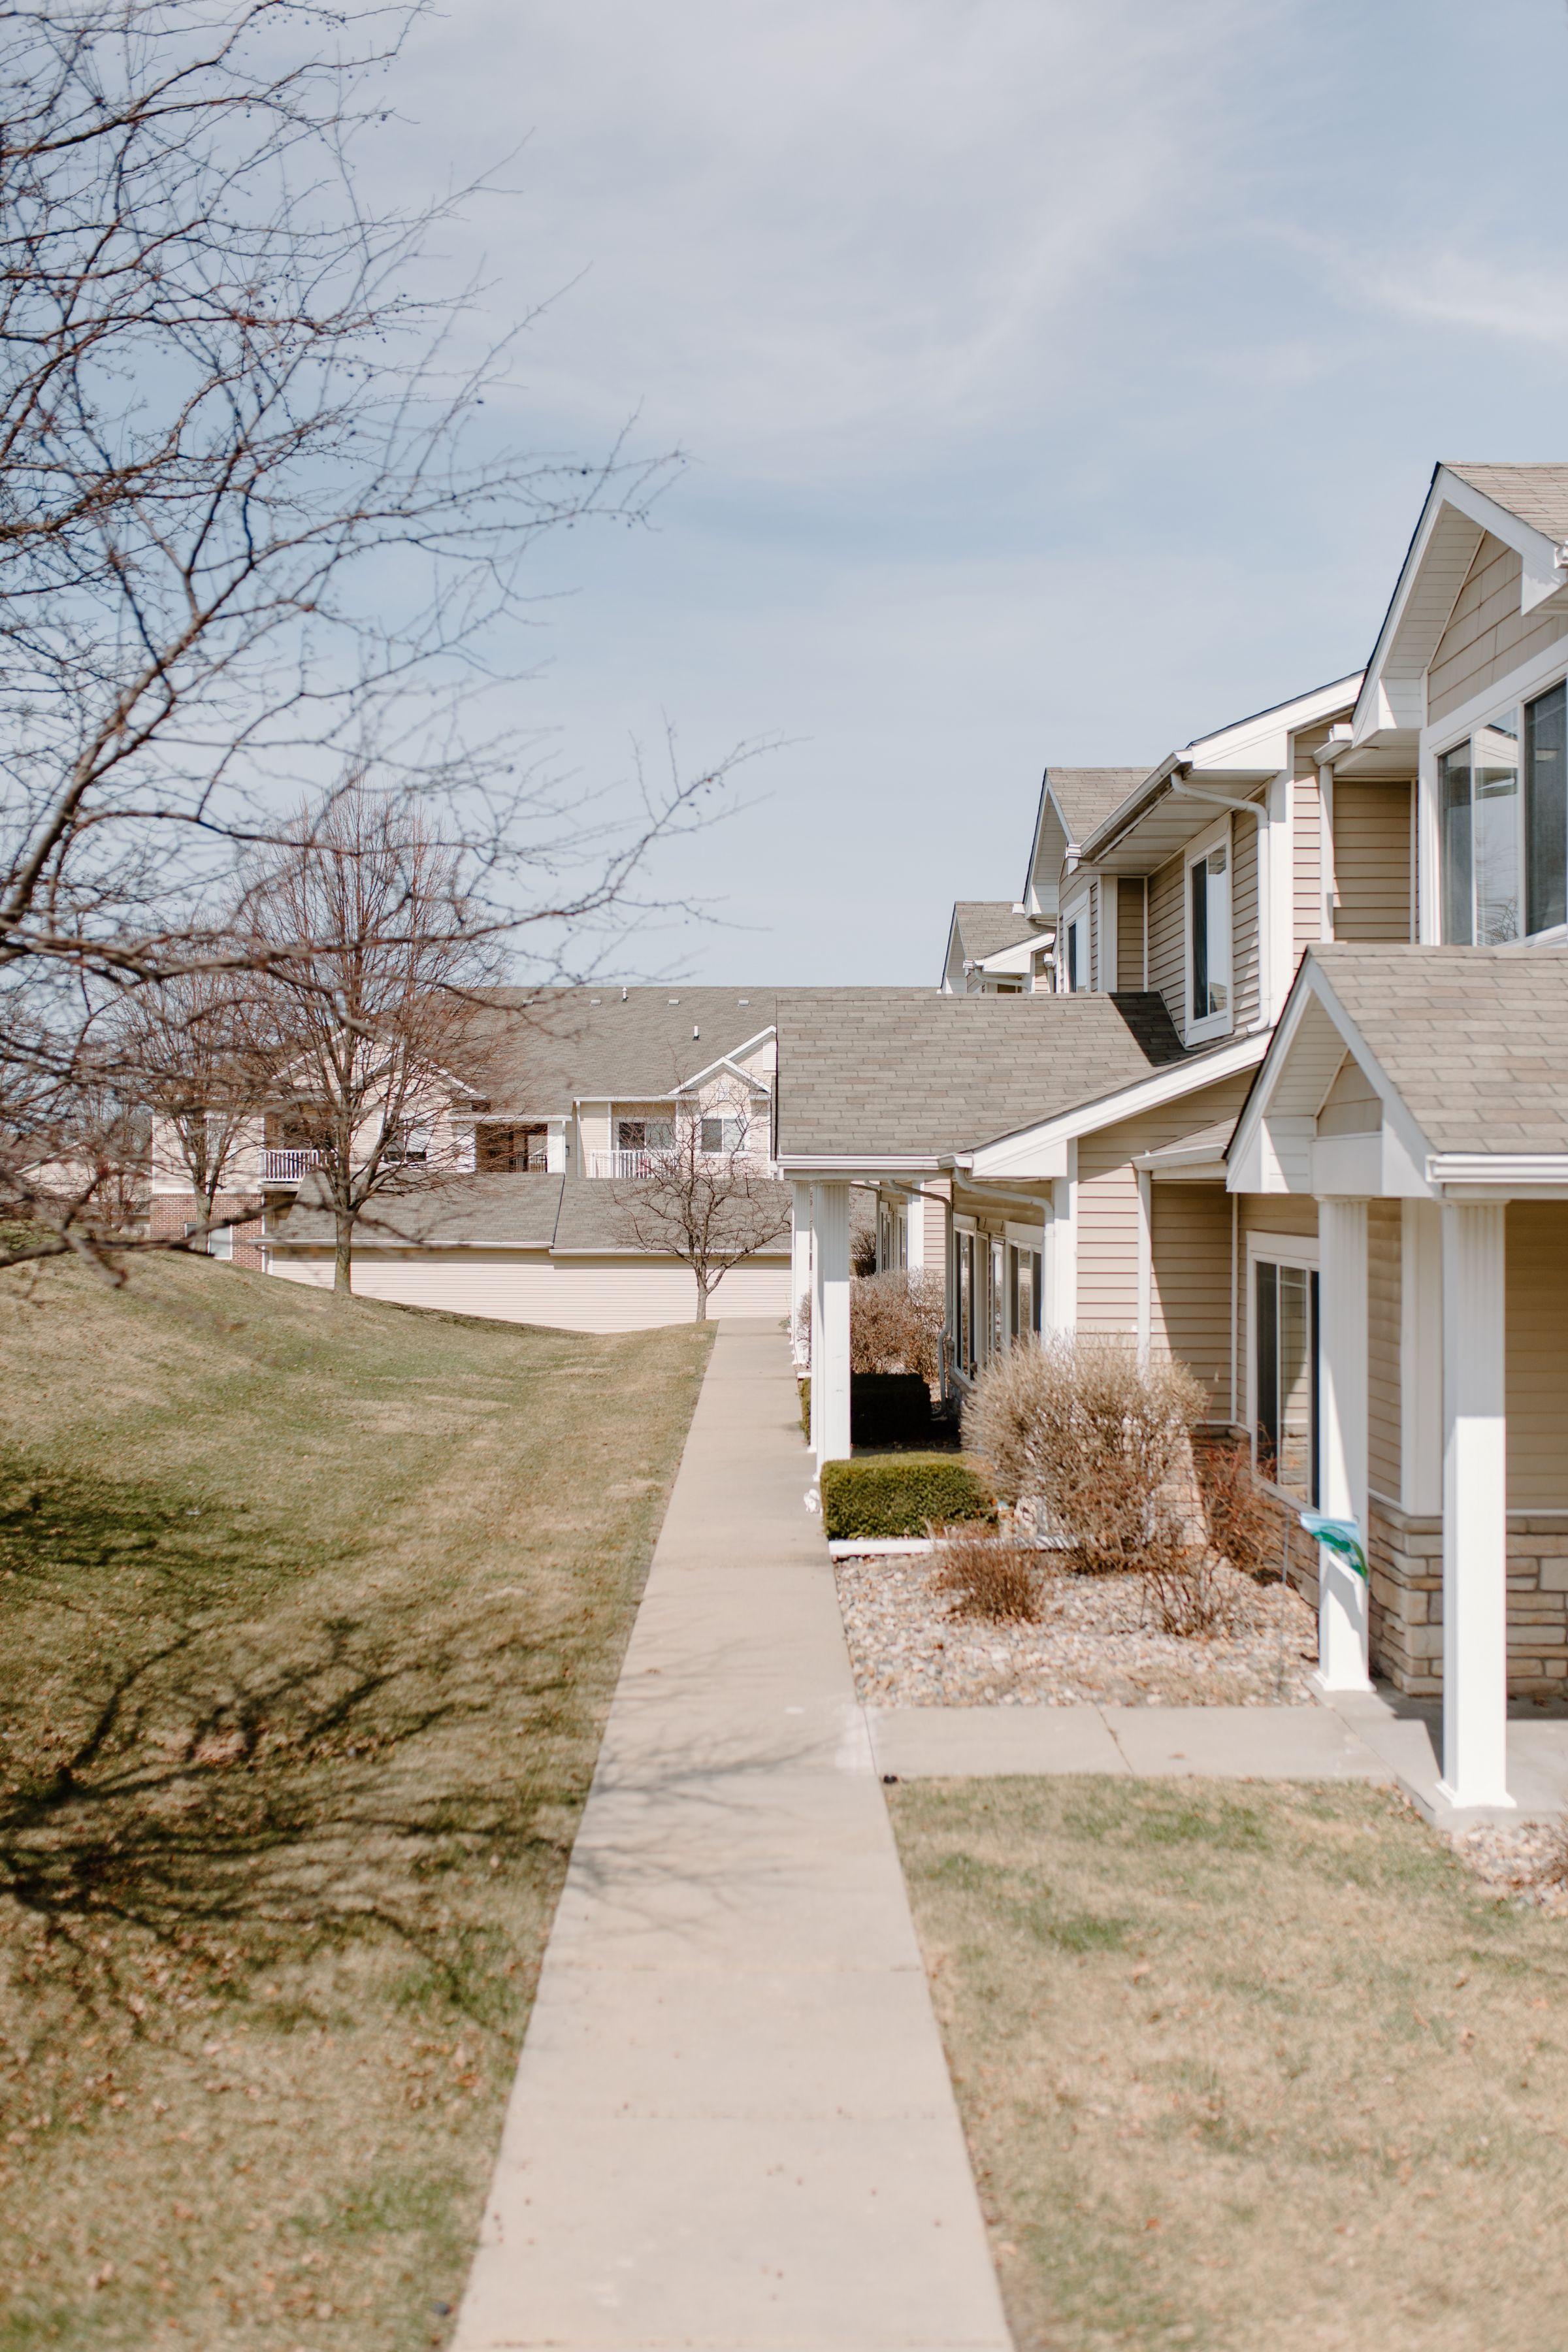 residential-polk-county-iowa-0-acres-listing-number-15418-2-2021-03-22-162126.jpg